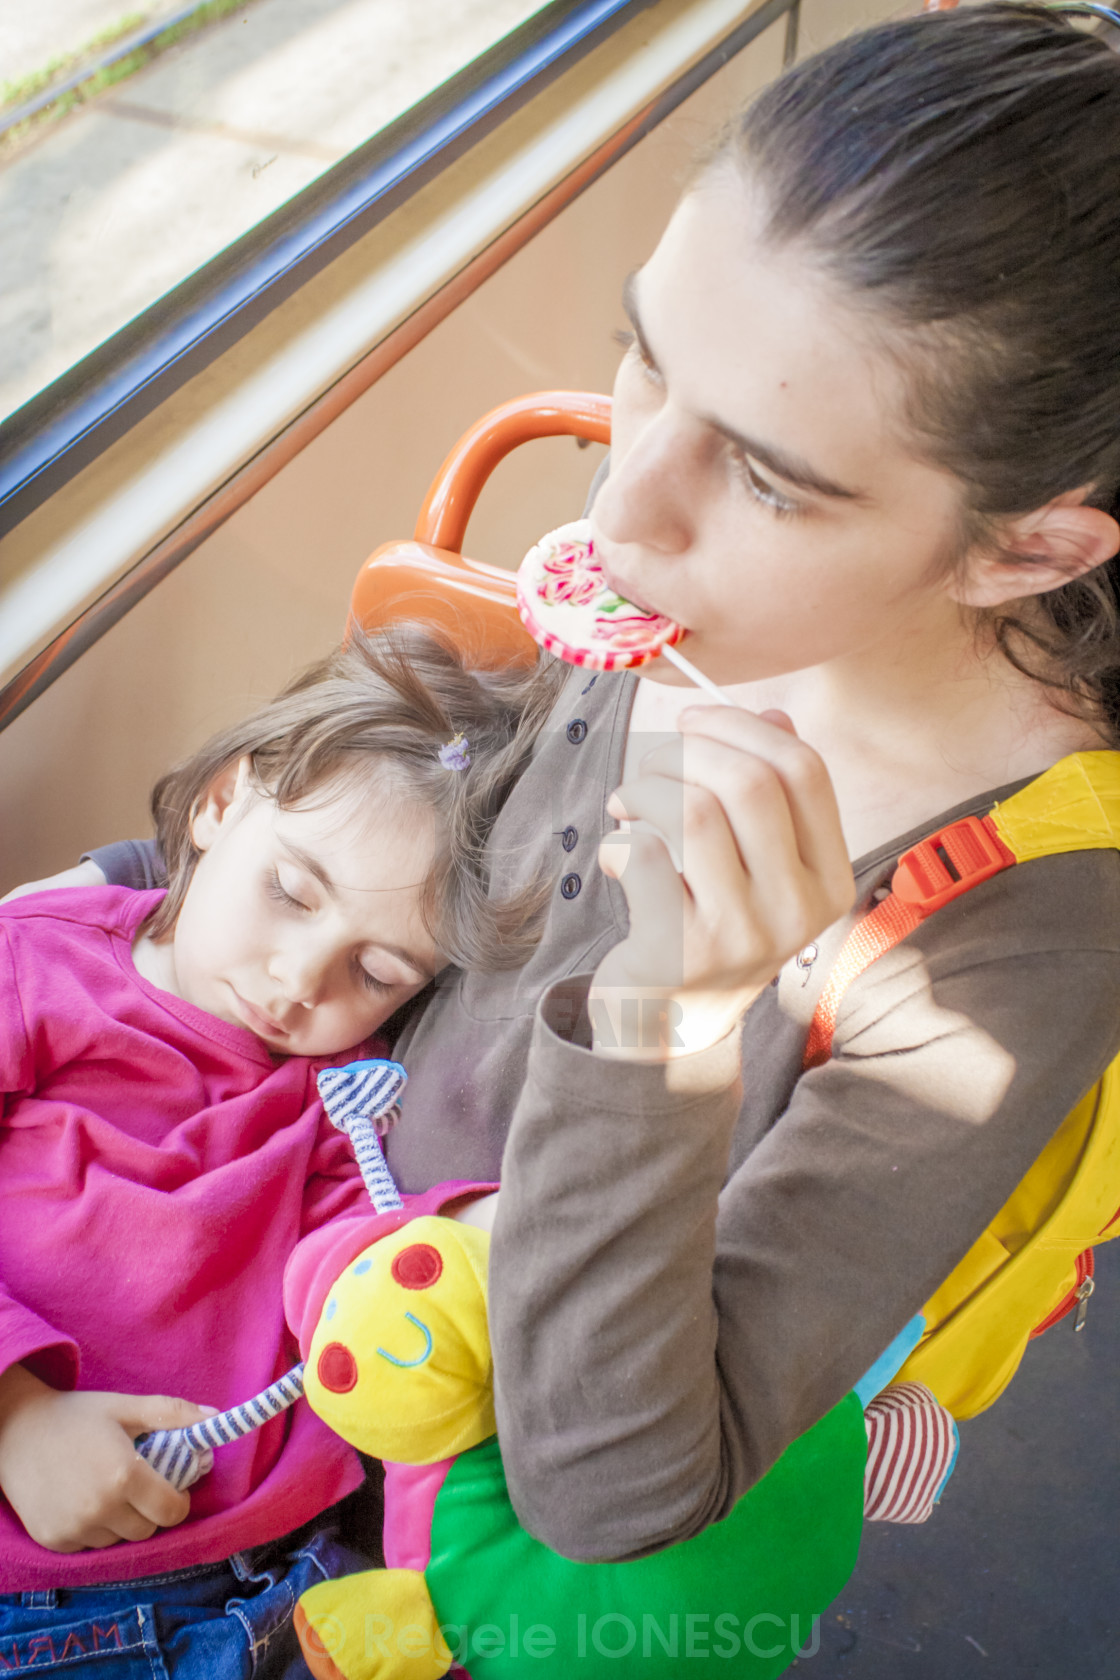 """Mother Holding Sleeping Toddler Eating Lollipop"" stock image"